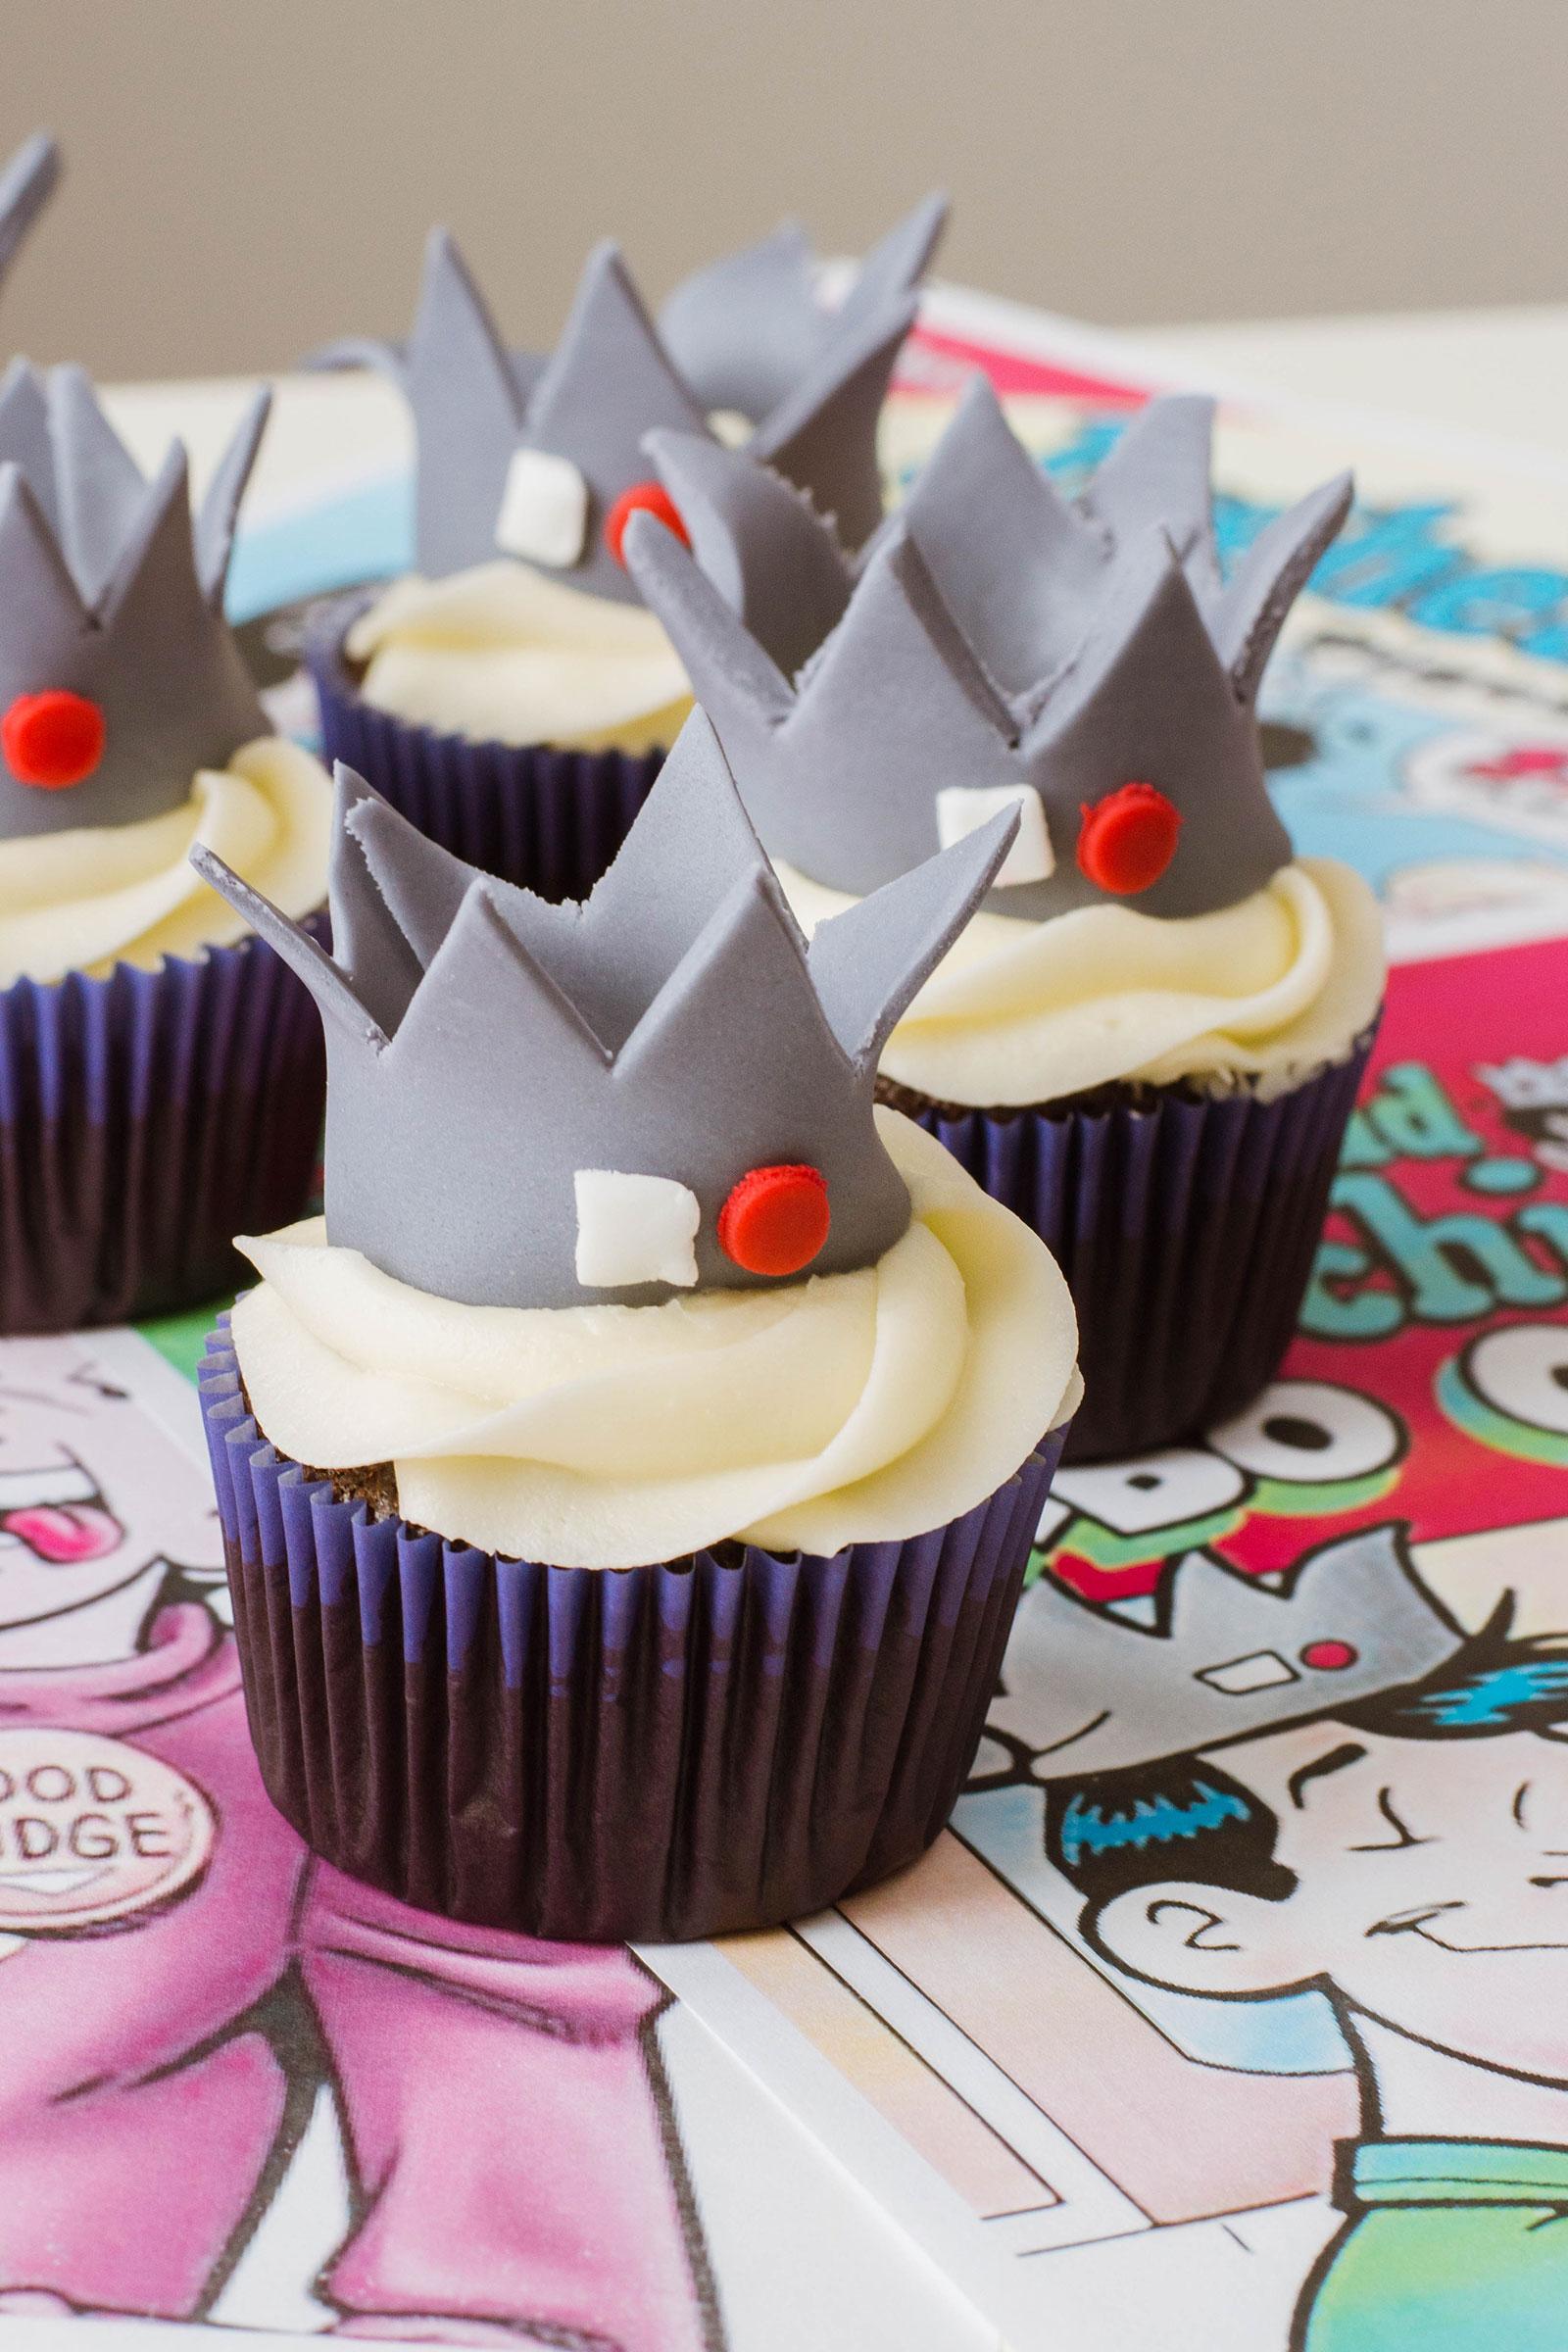 Riverdale-Inspired Recipe: Jughead Cupcakes